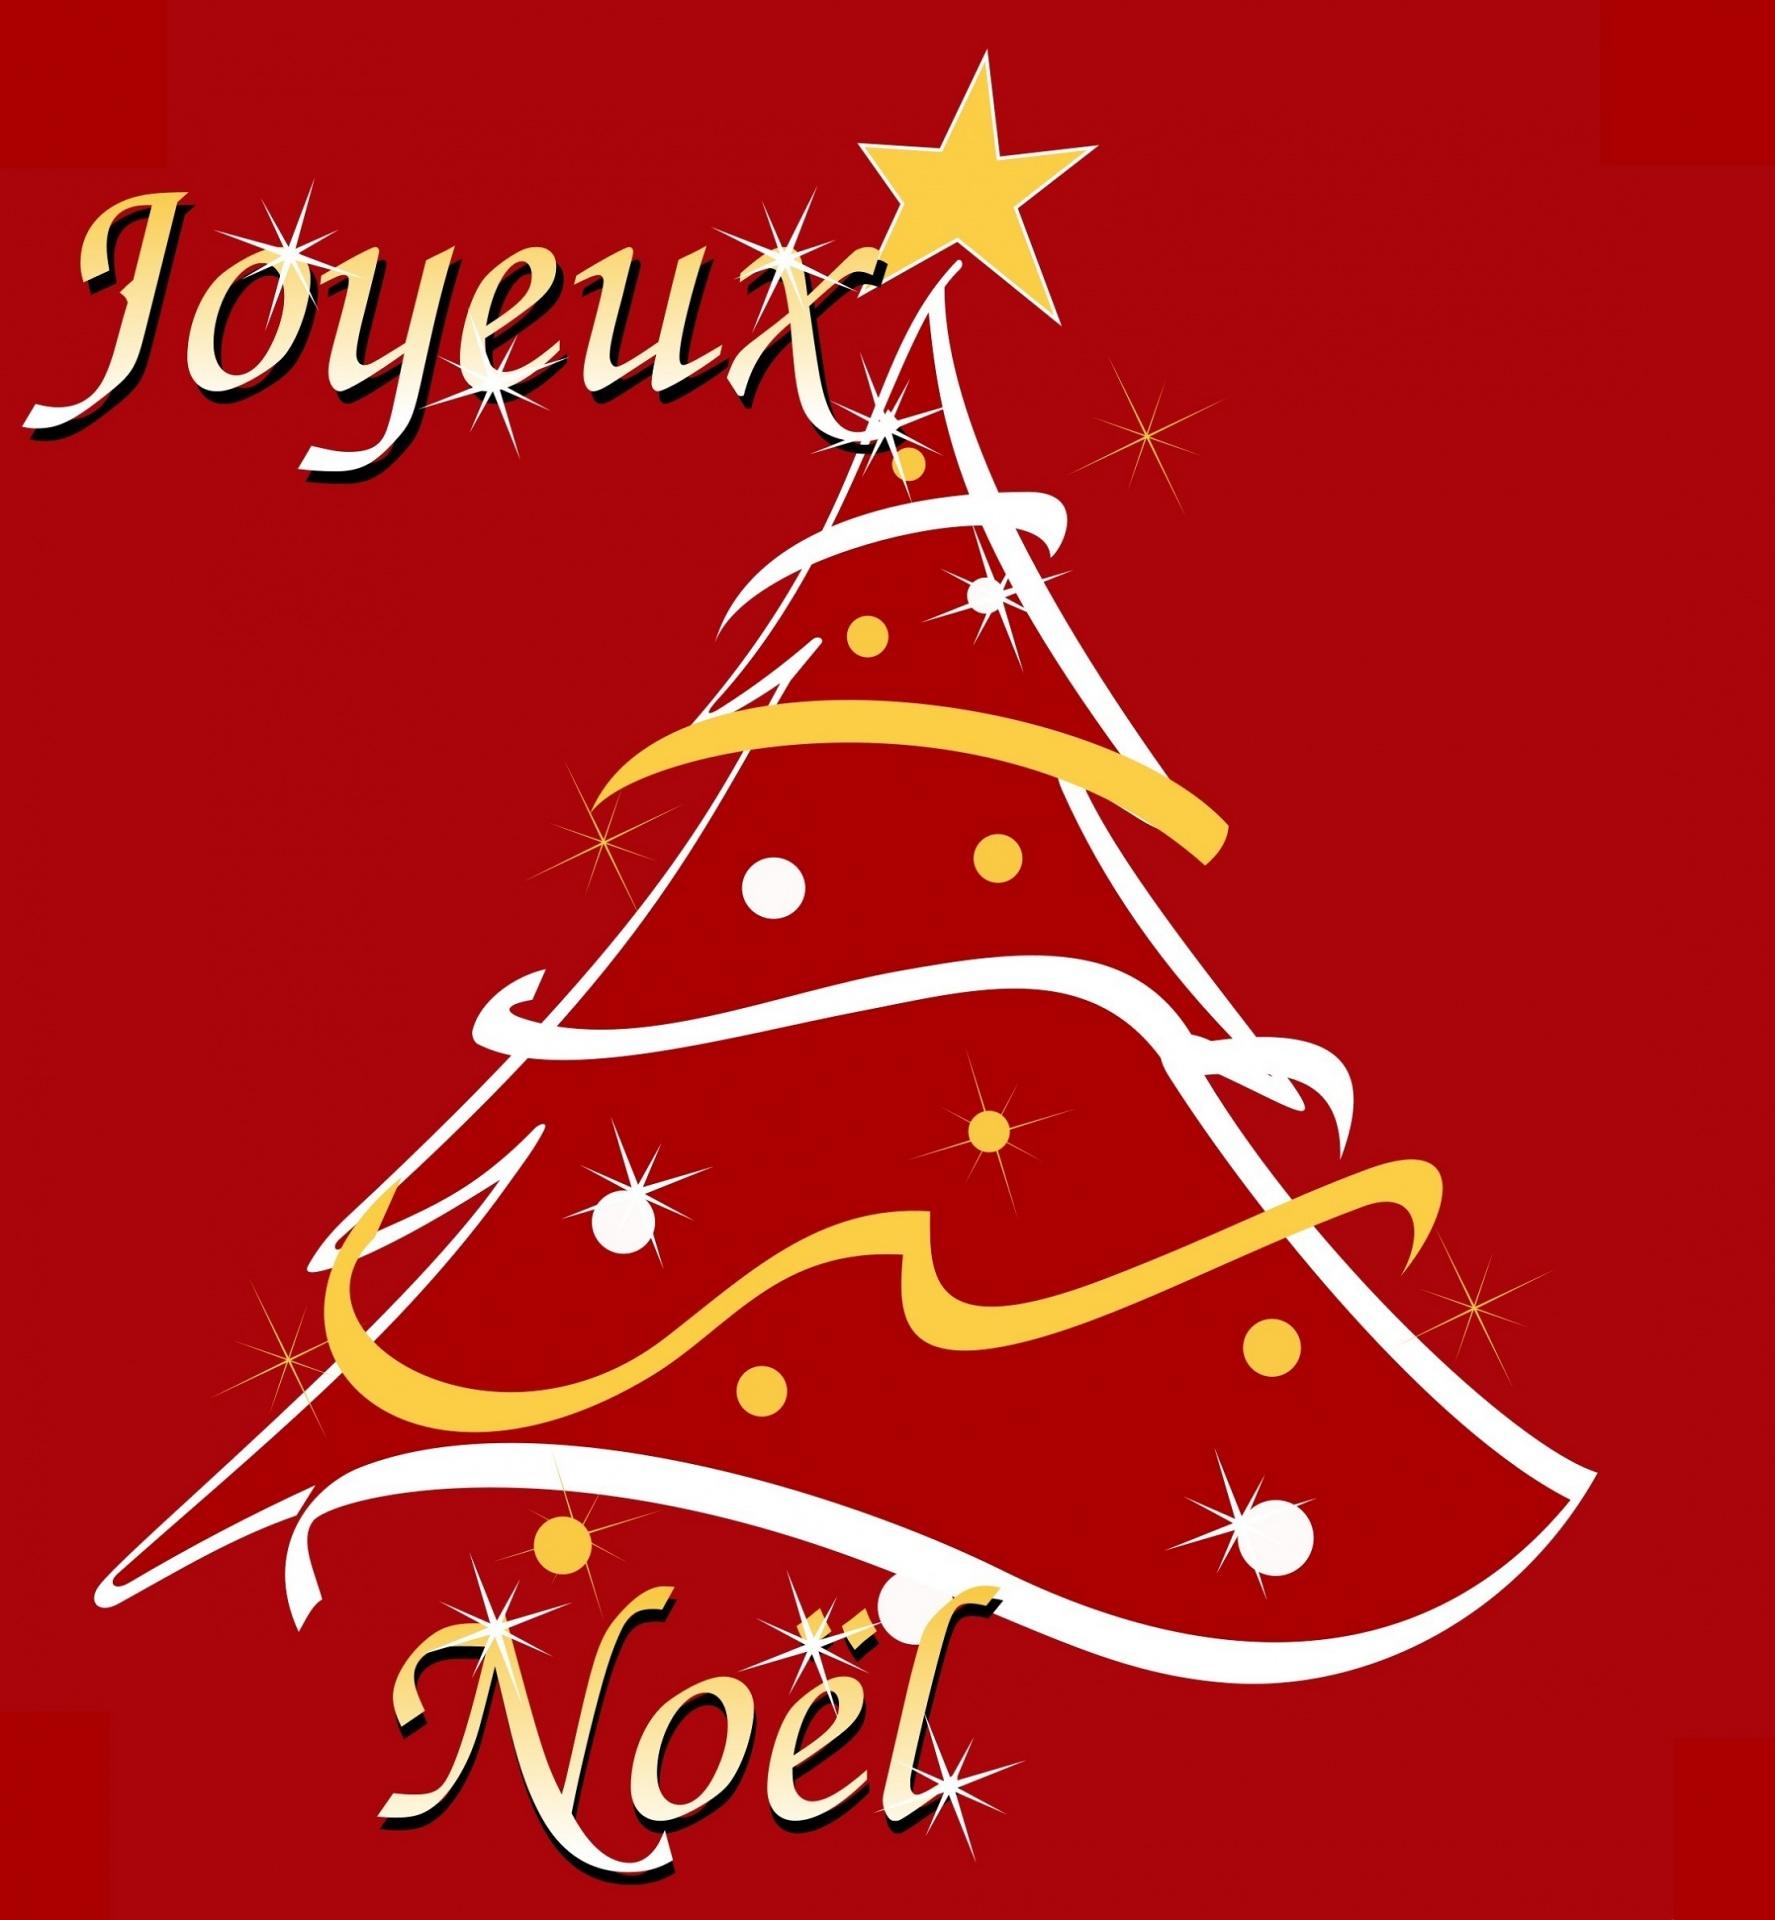 Joyeux Noel Clipart.Christmas Tree Stylized Art Clipart Free Photo From